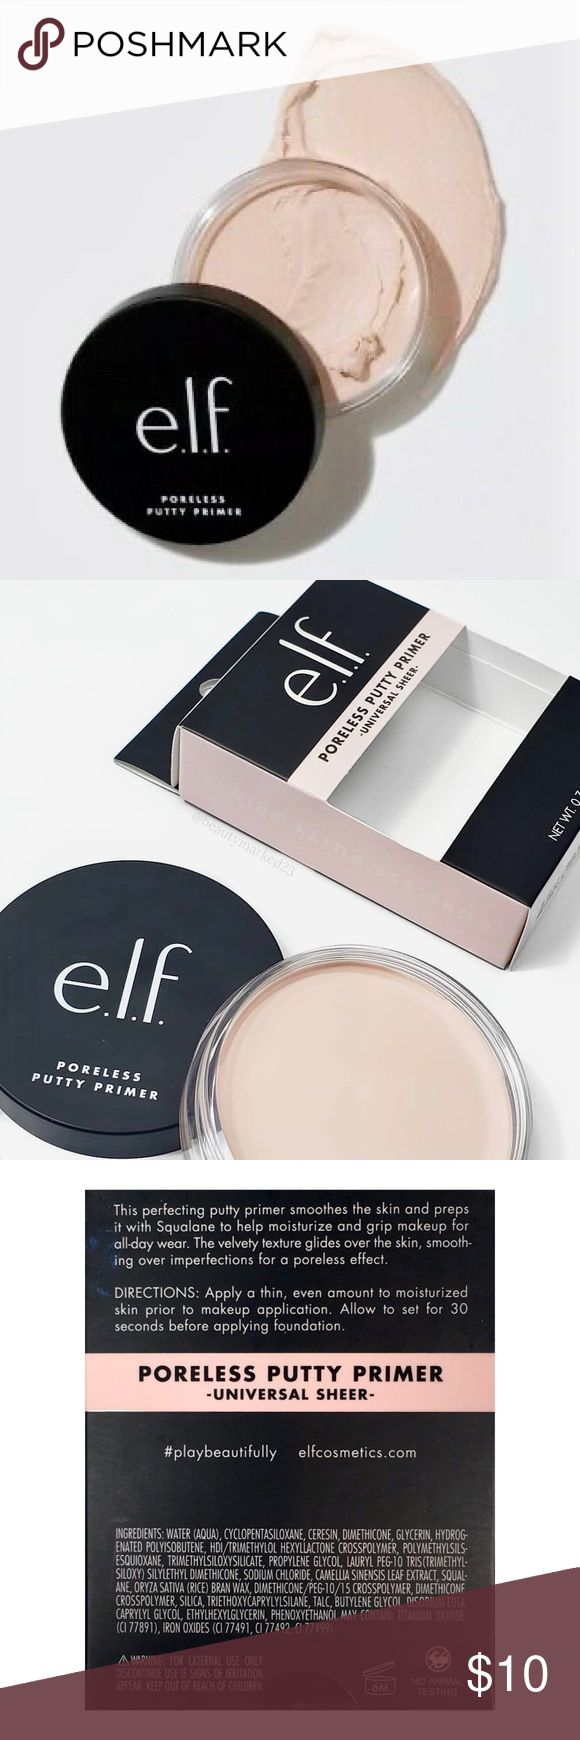 ⭐️[e.l.f. Cosmetics] BNIB Poreless Putty Primer Makeup